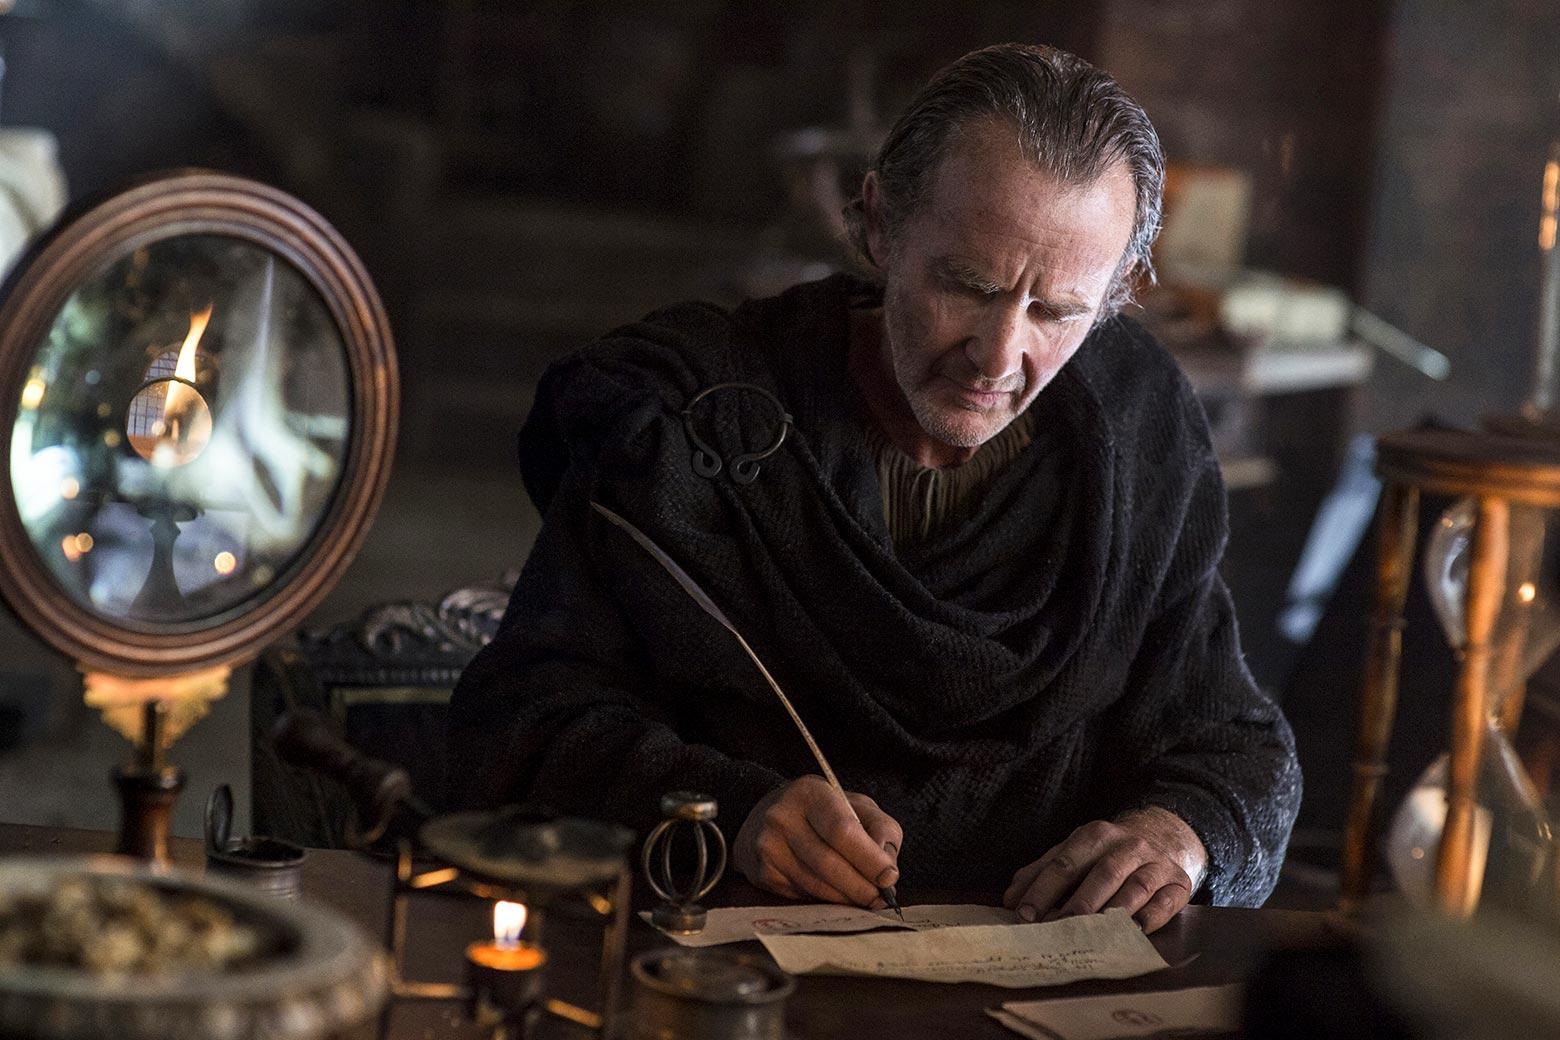 Anton Lesser as Qyburn in Game of Thrones.